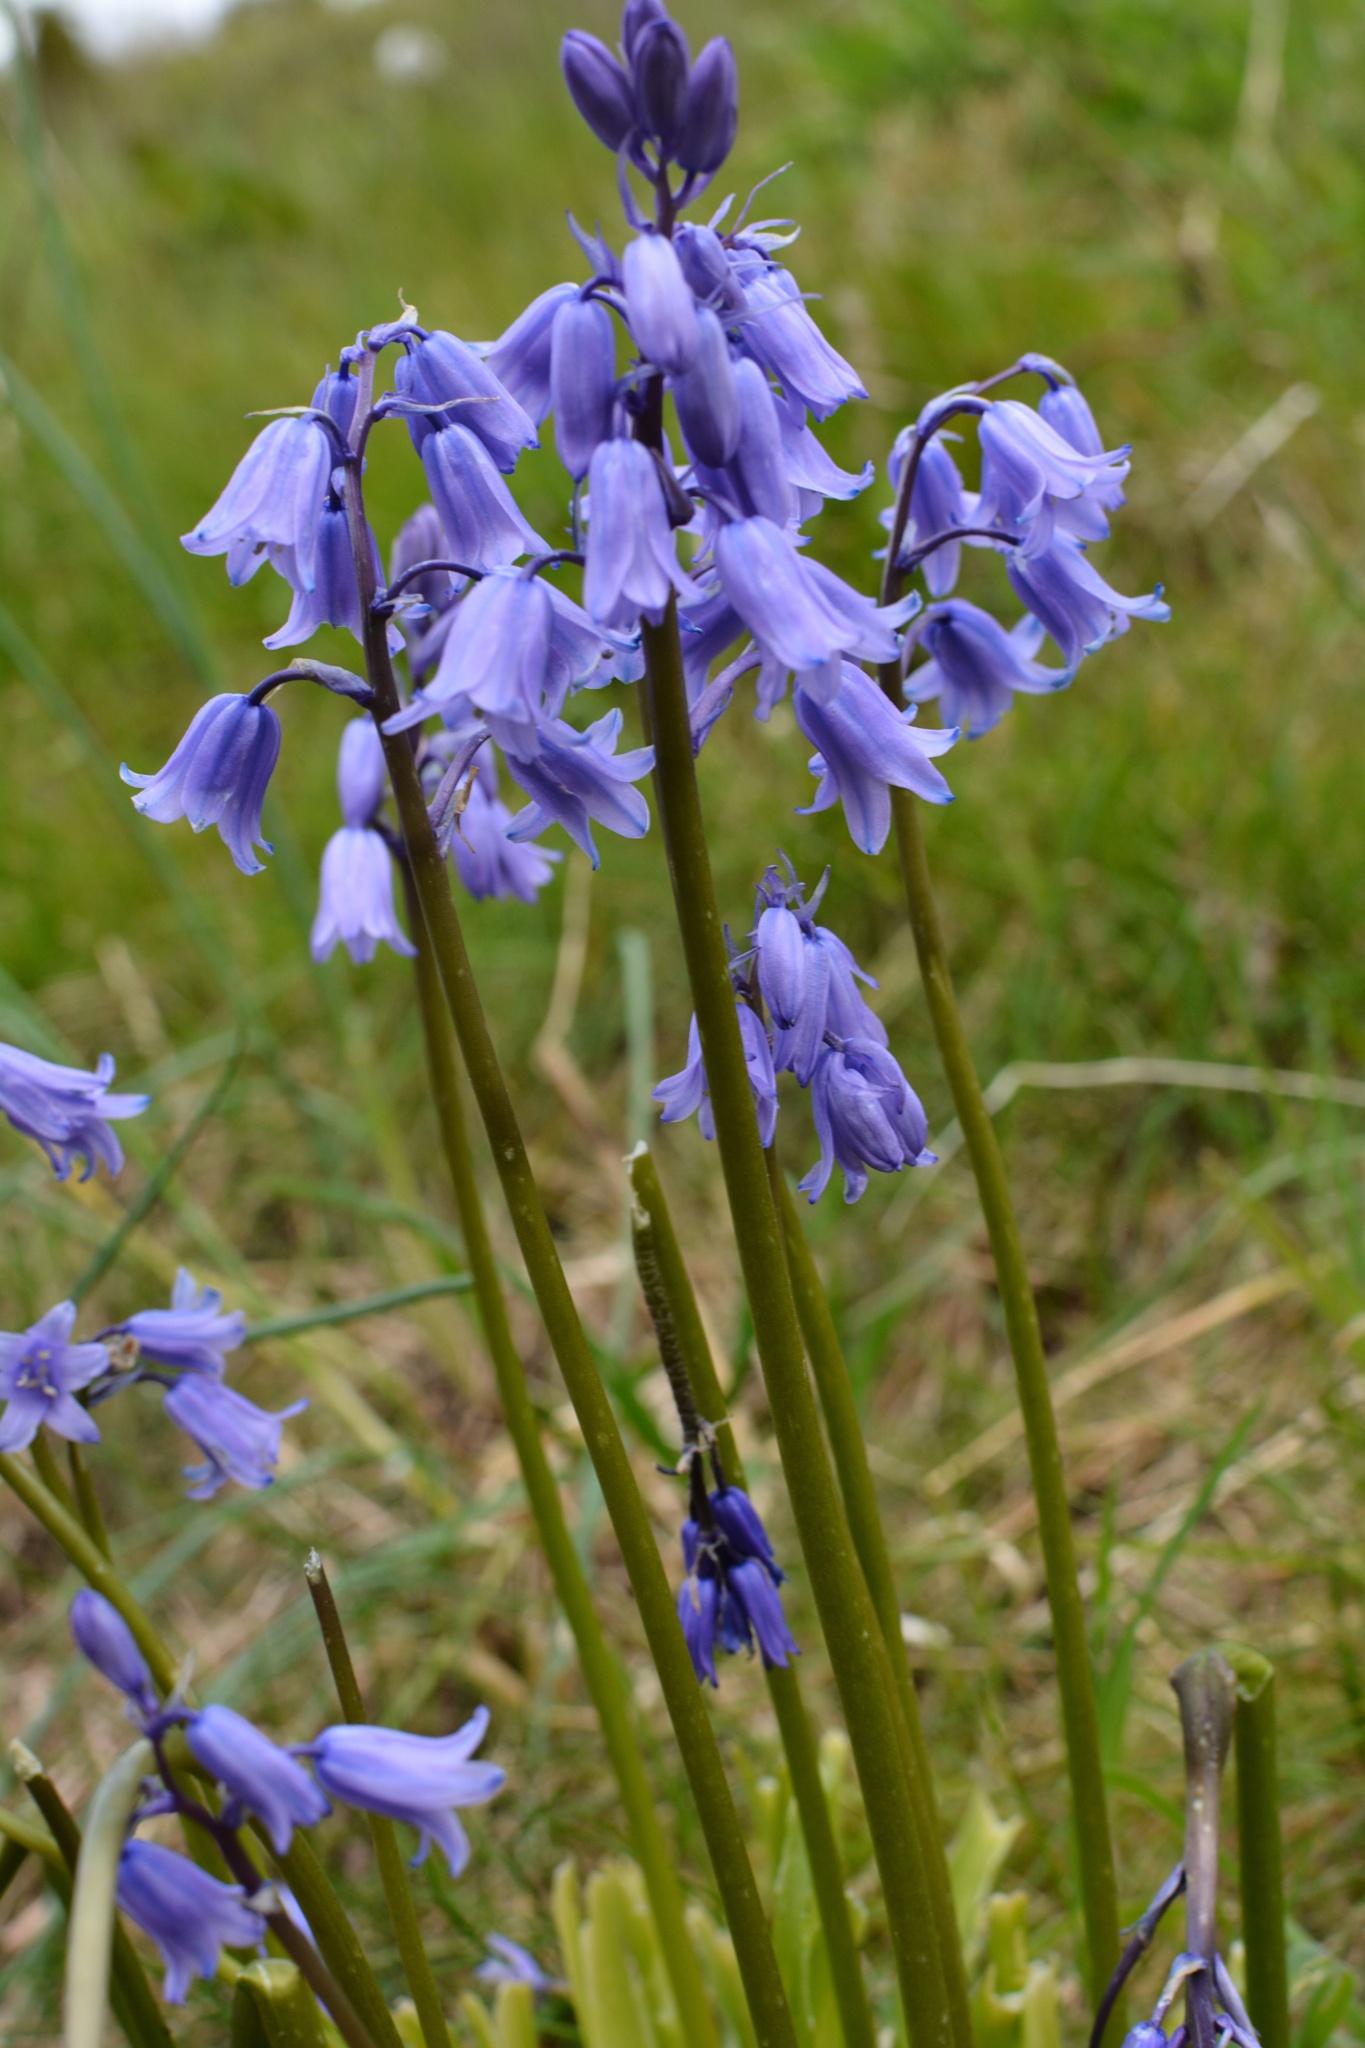 Bluebells (Campanula rotundifolia) by Lars-Toralf Utnes Storstrand